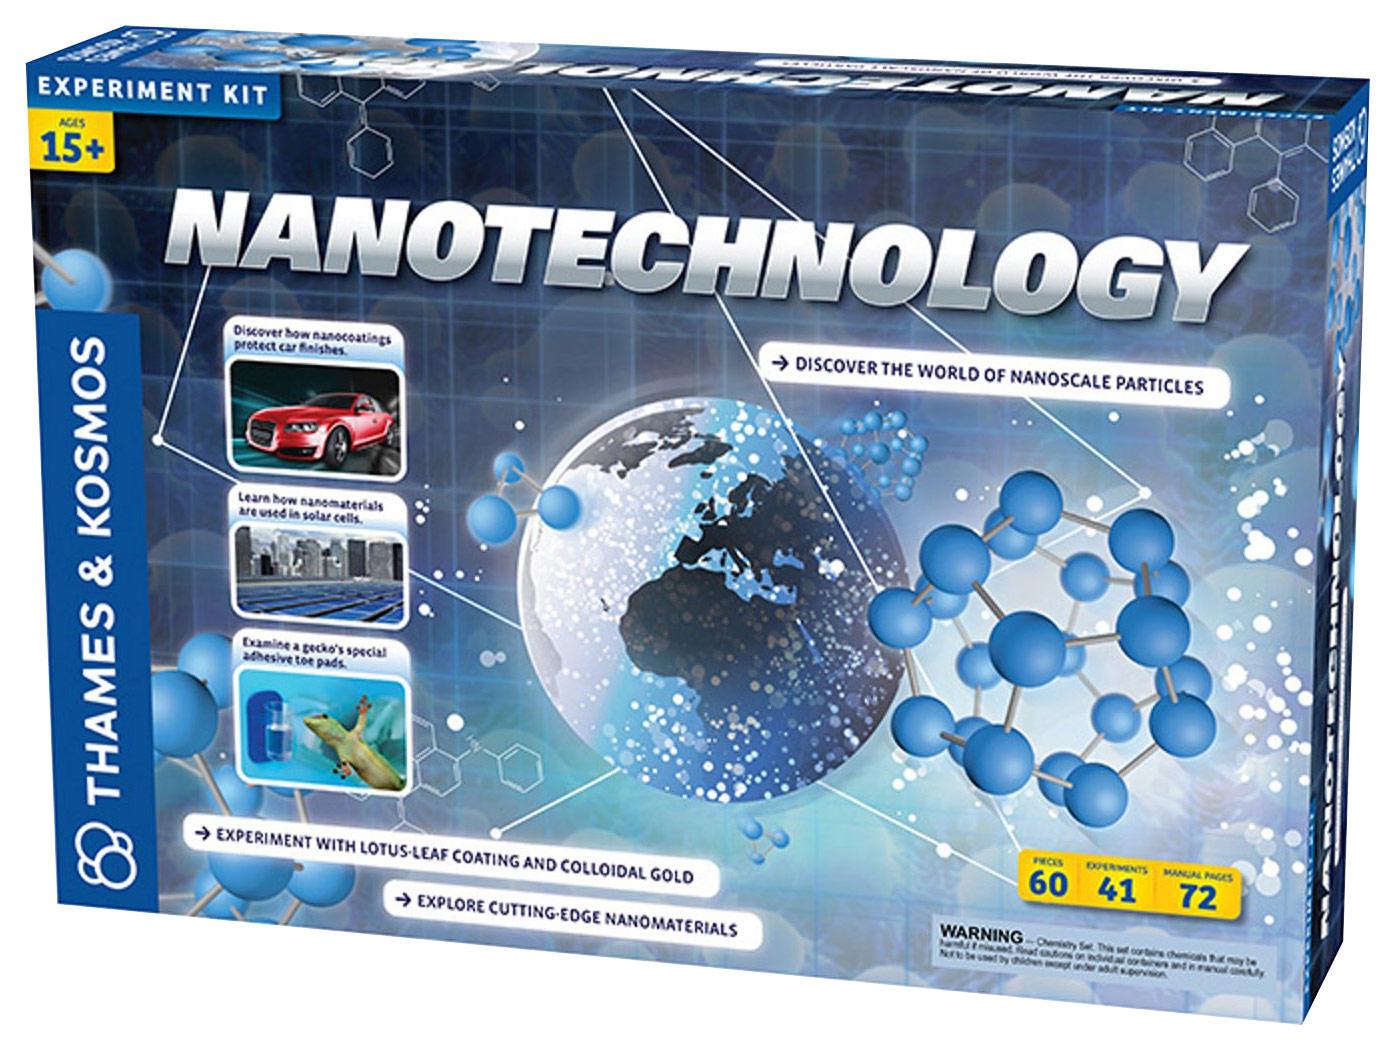 Thames & Kosmos - Nanotechnology Kit 4670812